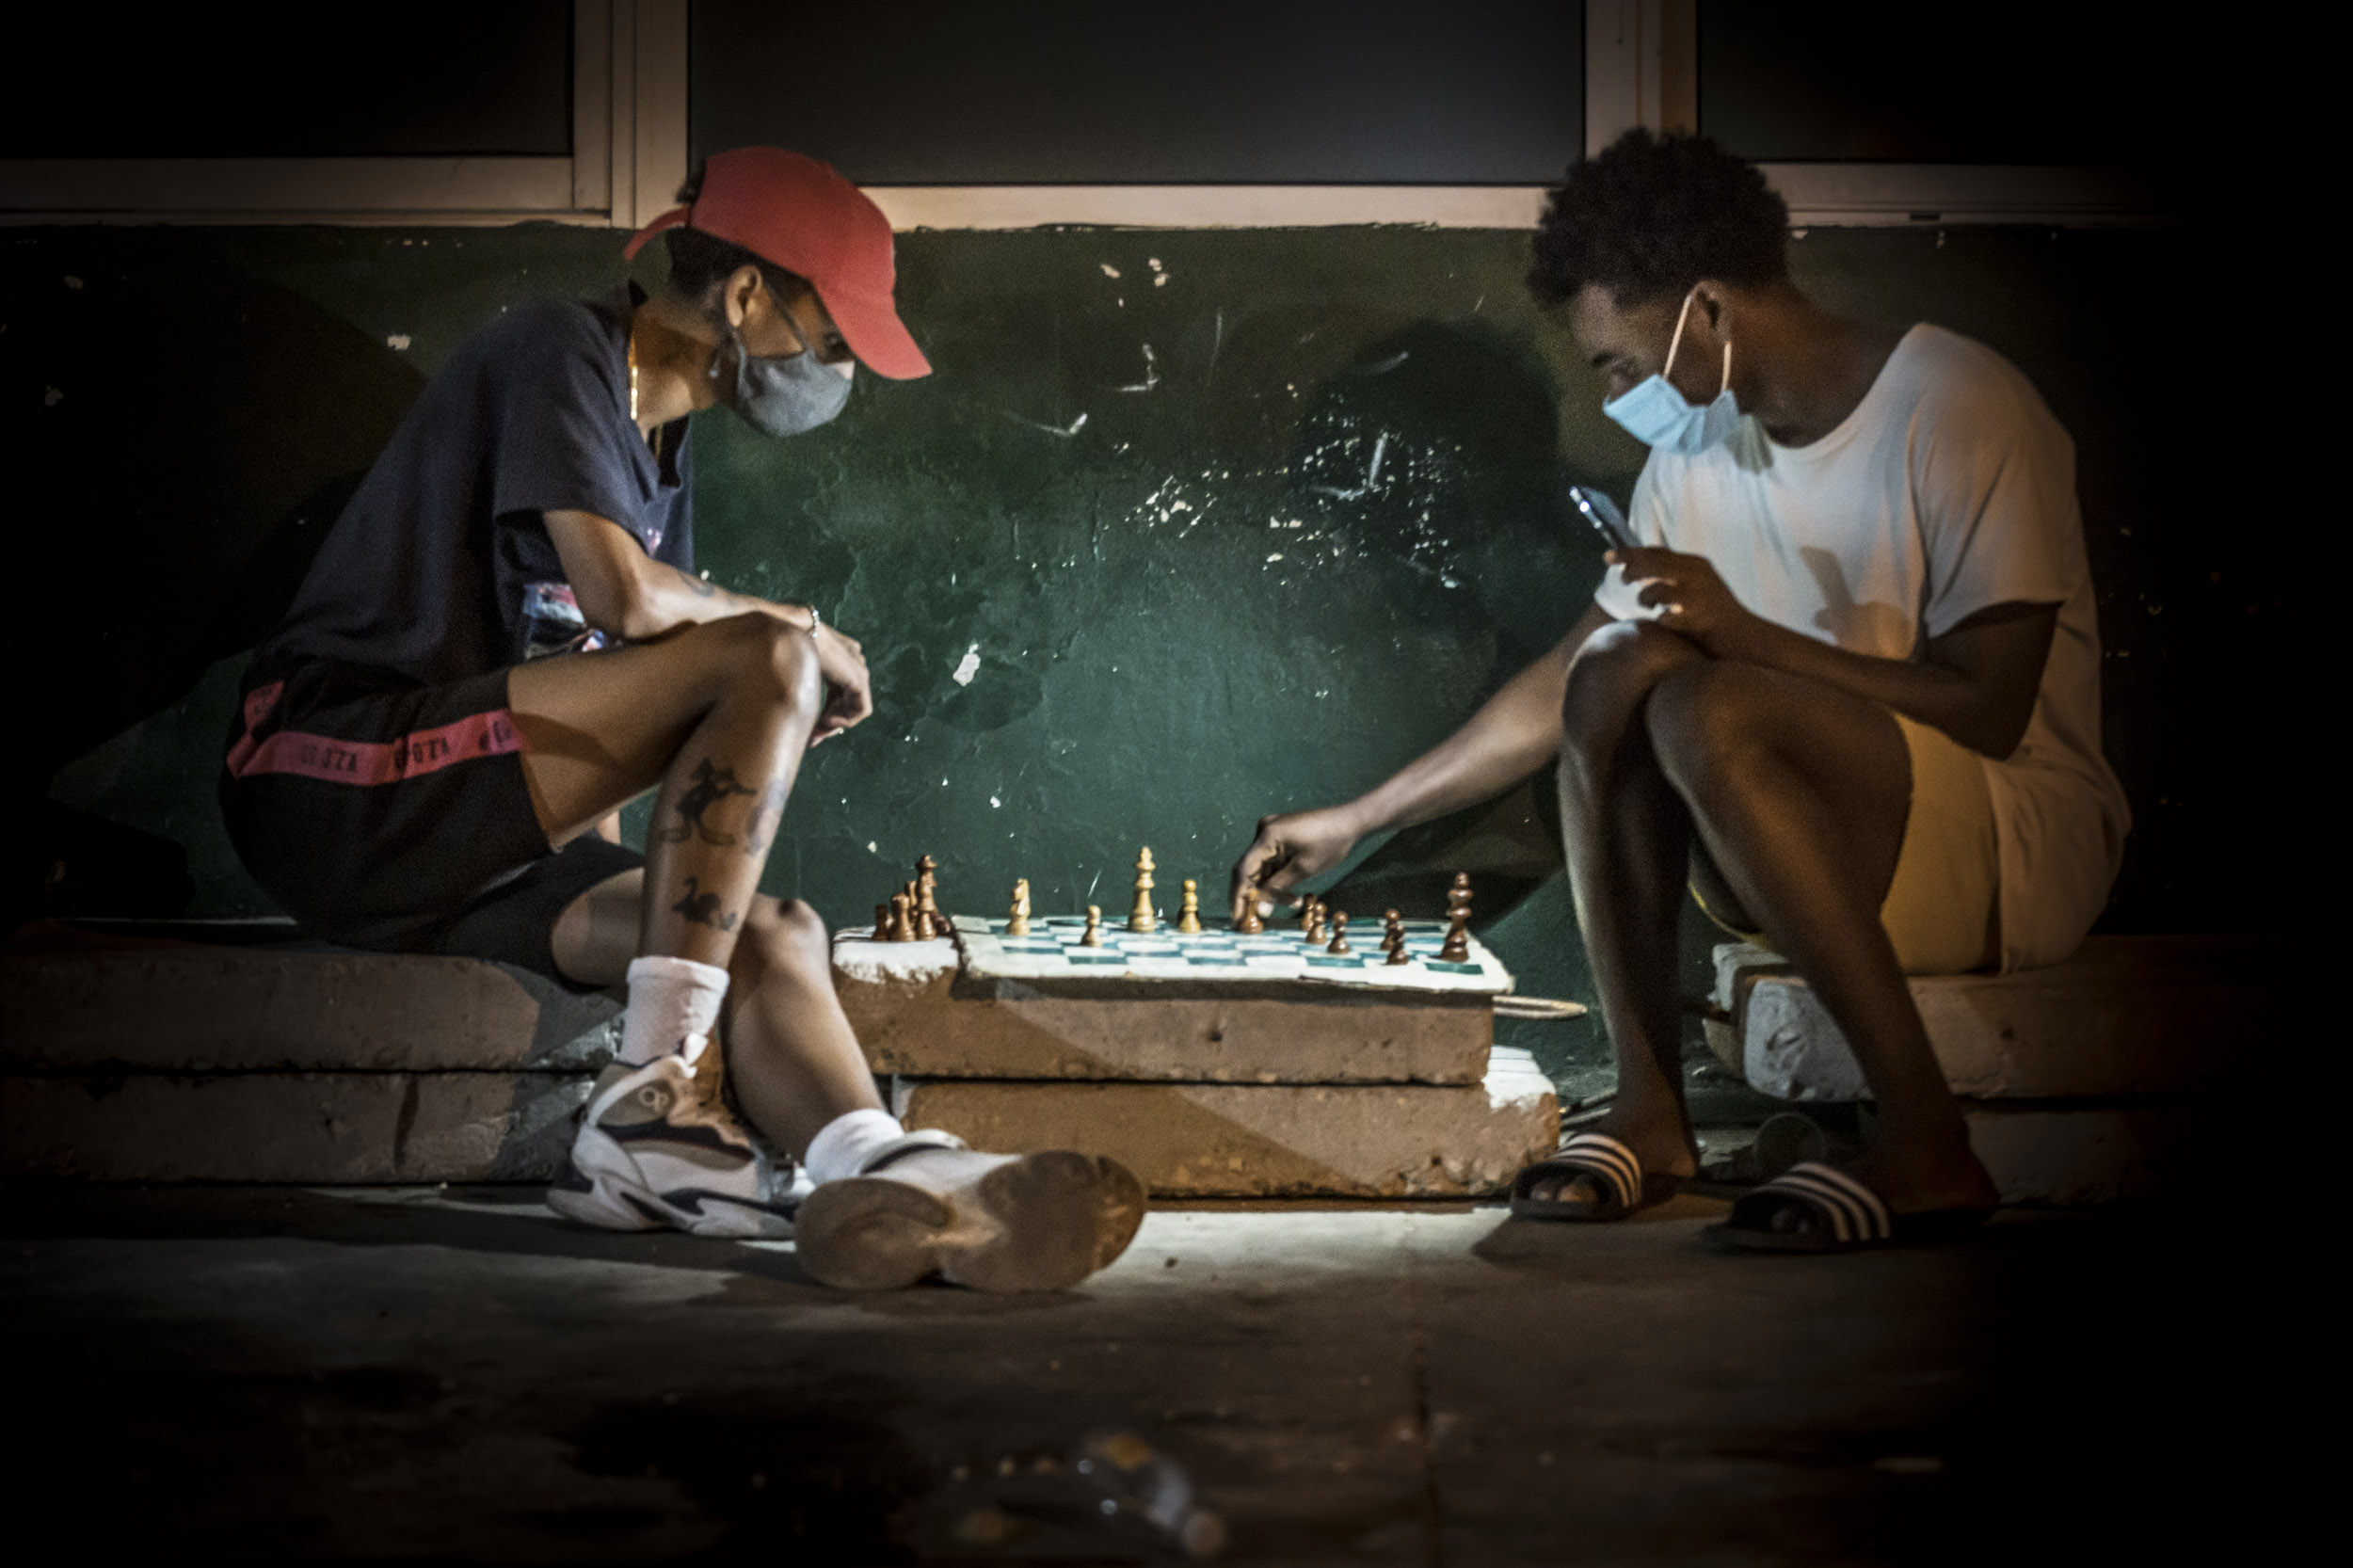 Ajedrez - Cuba - Hector Garrido, Aerial and human photography